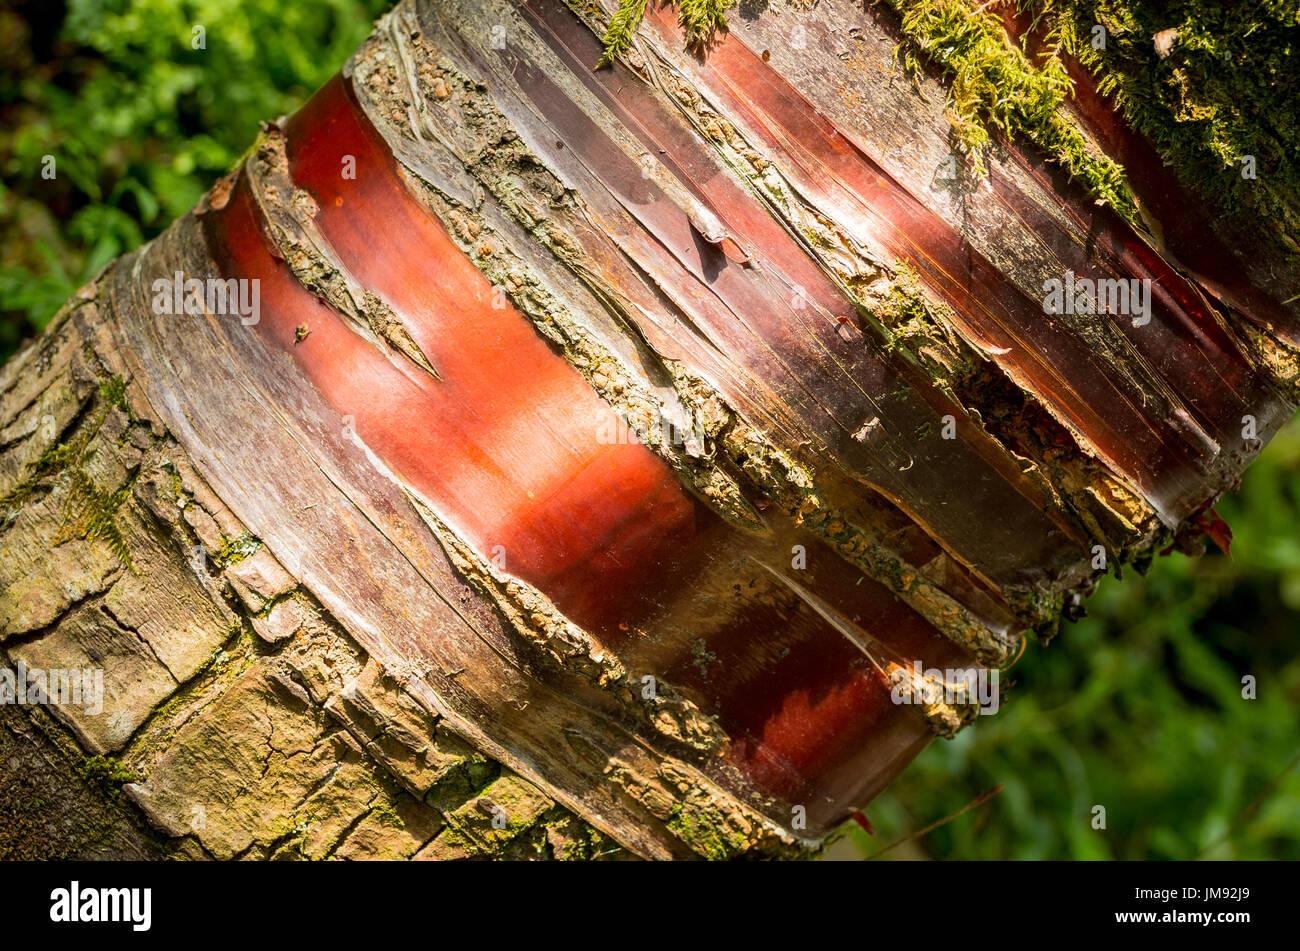 Polished mahogany-like bark of prunus serrula tree in UK - Stock Image